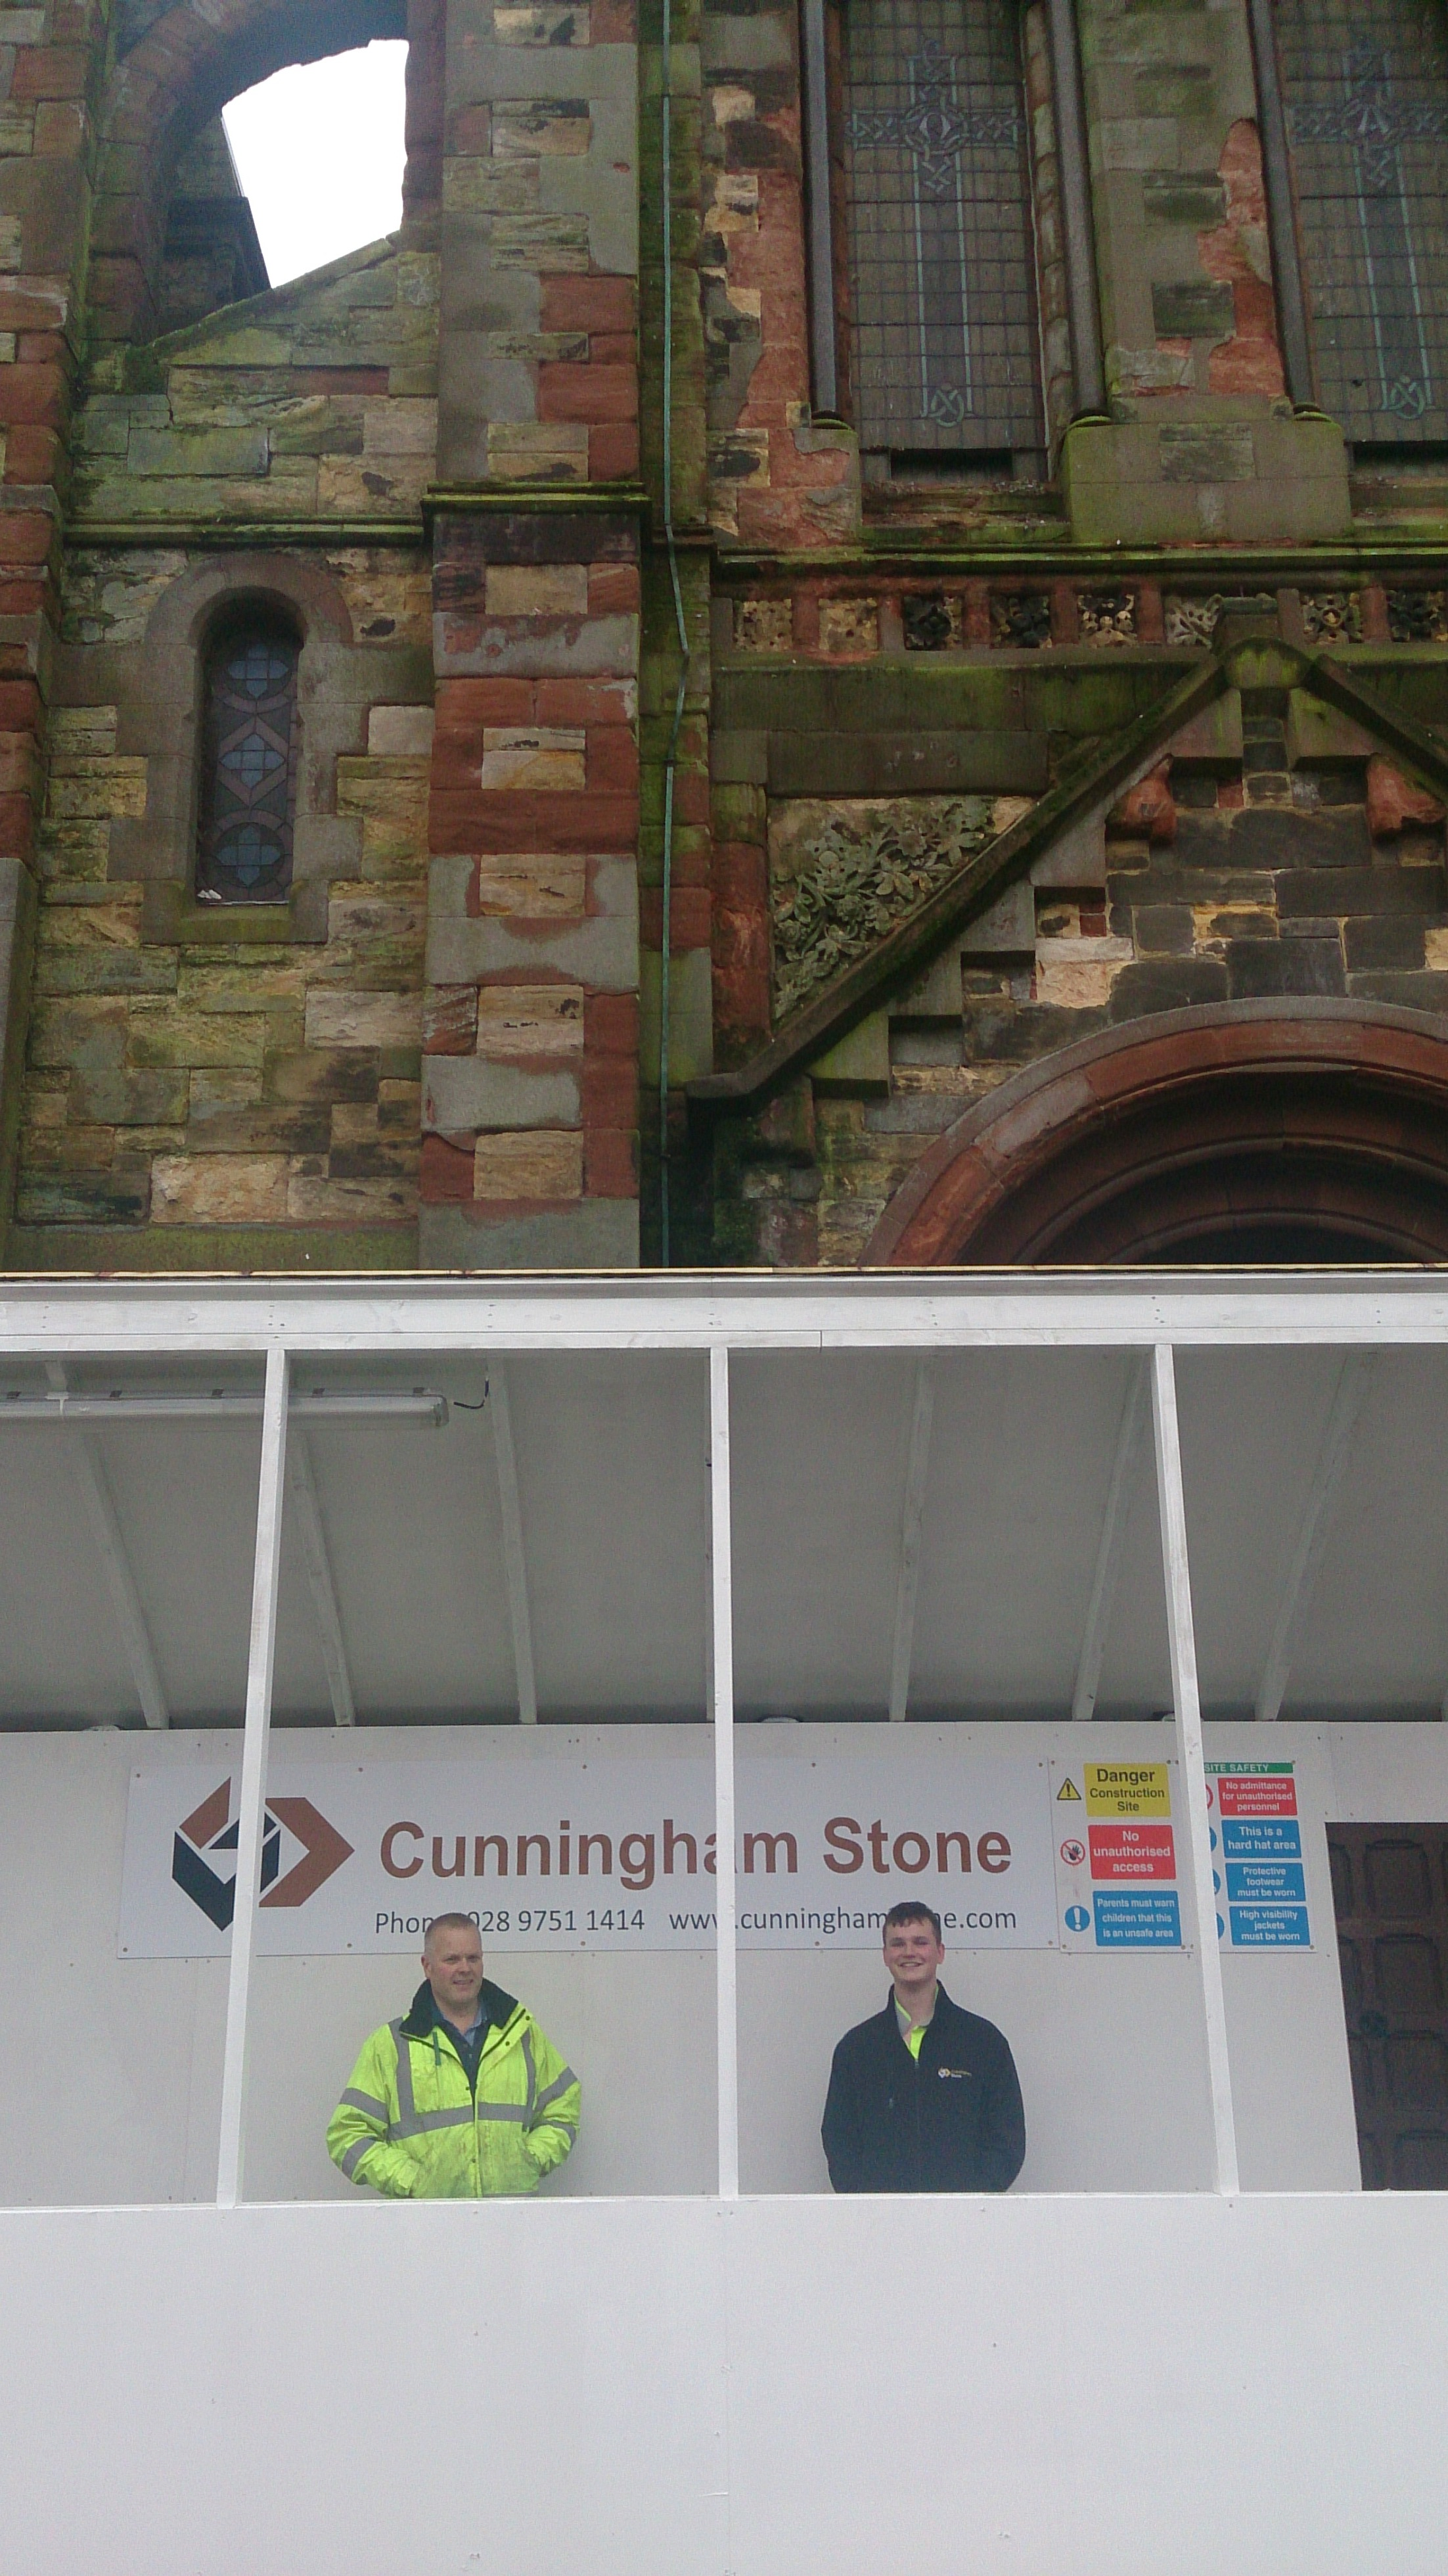 cunninghams.JPG